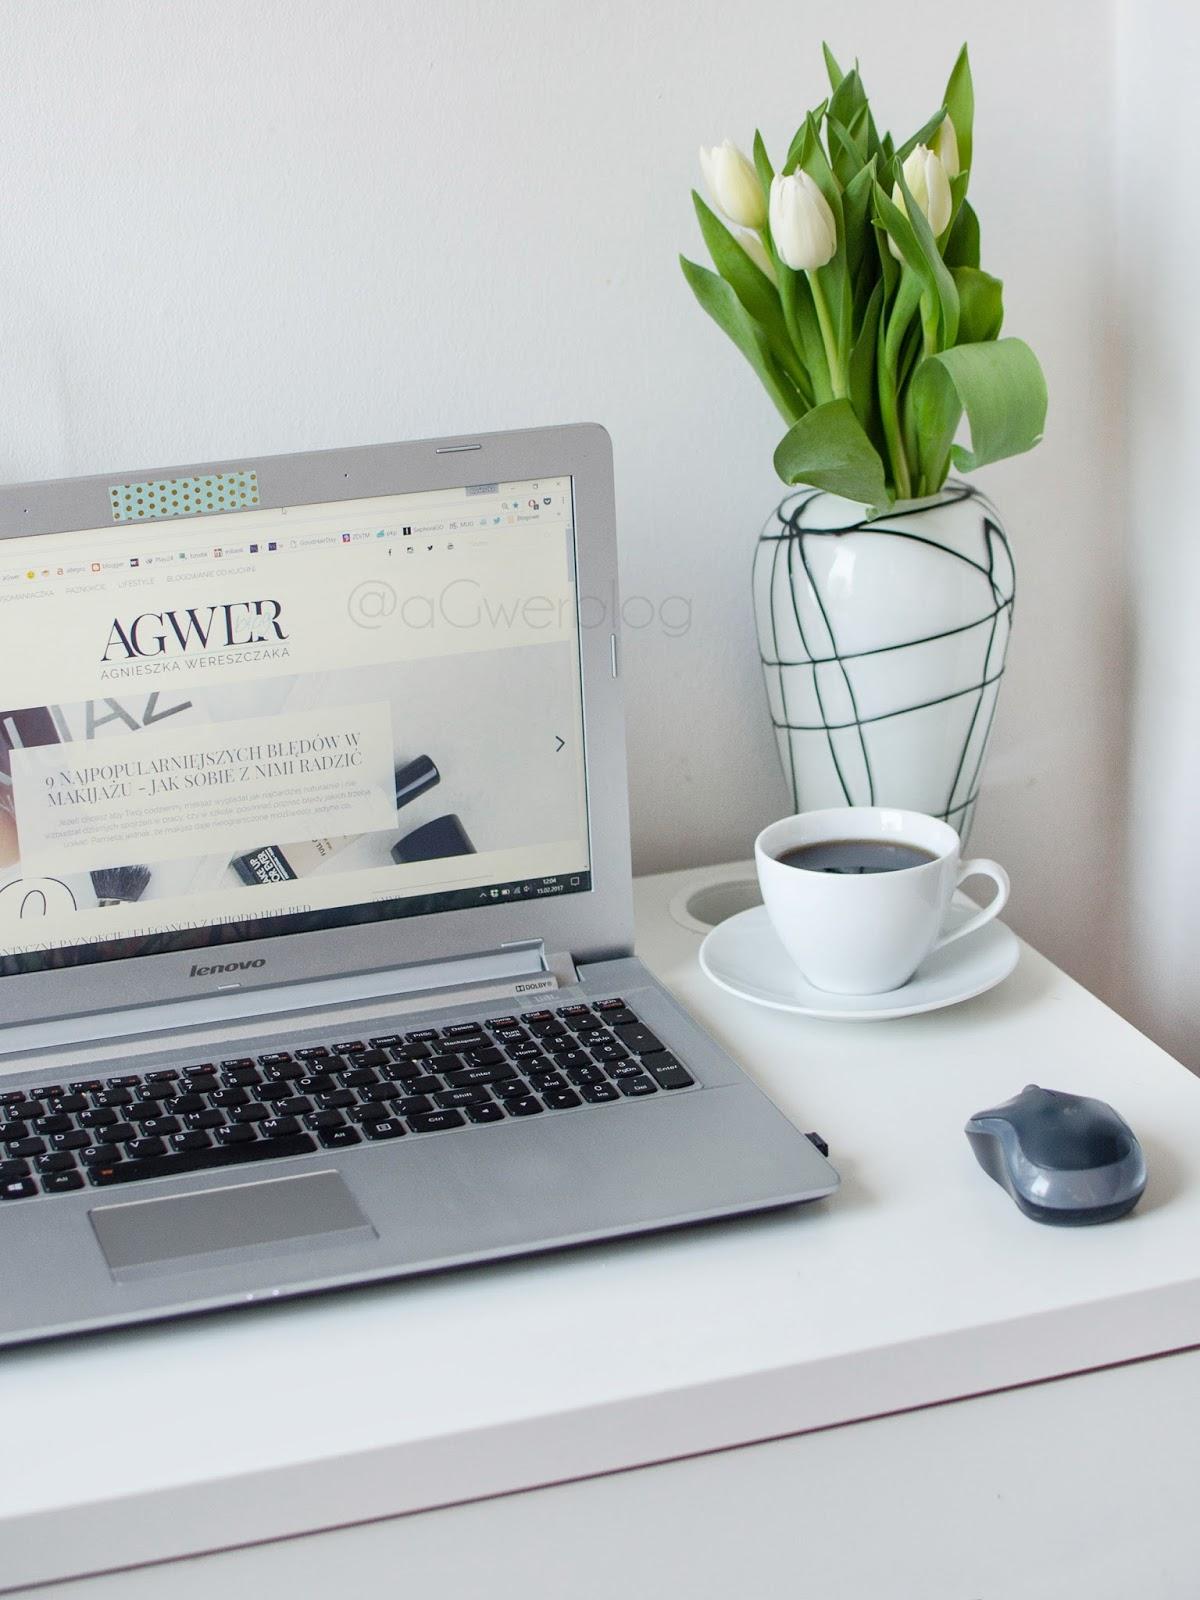 jak-promowac-bloga